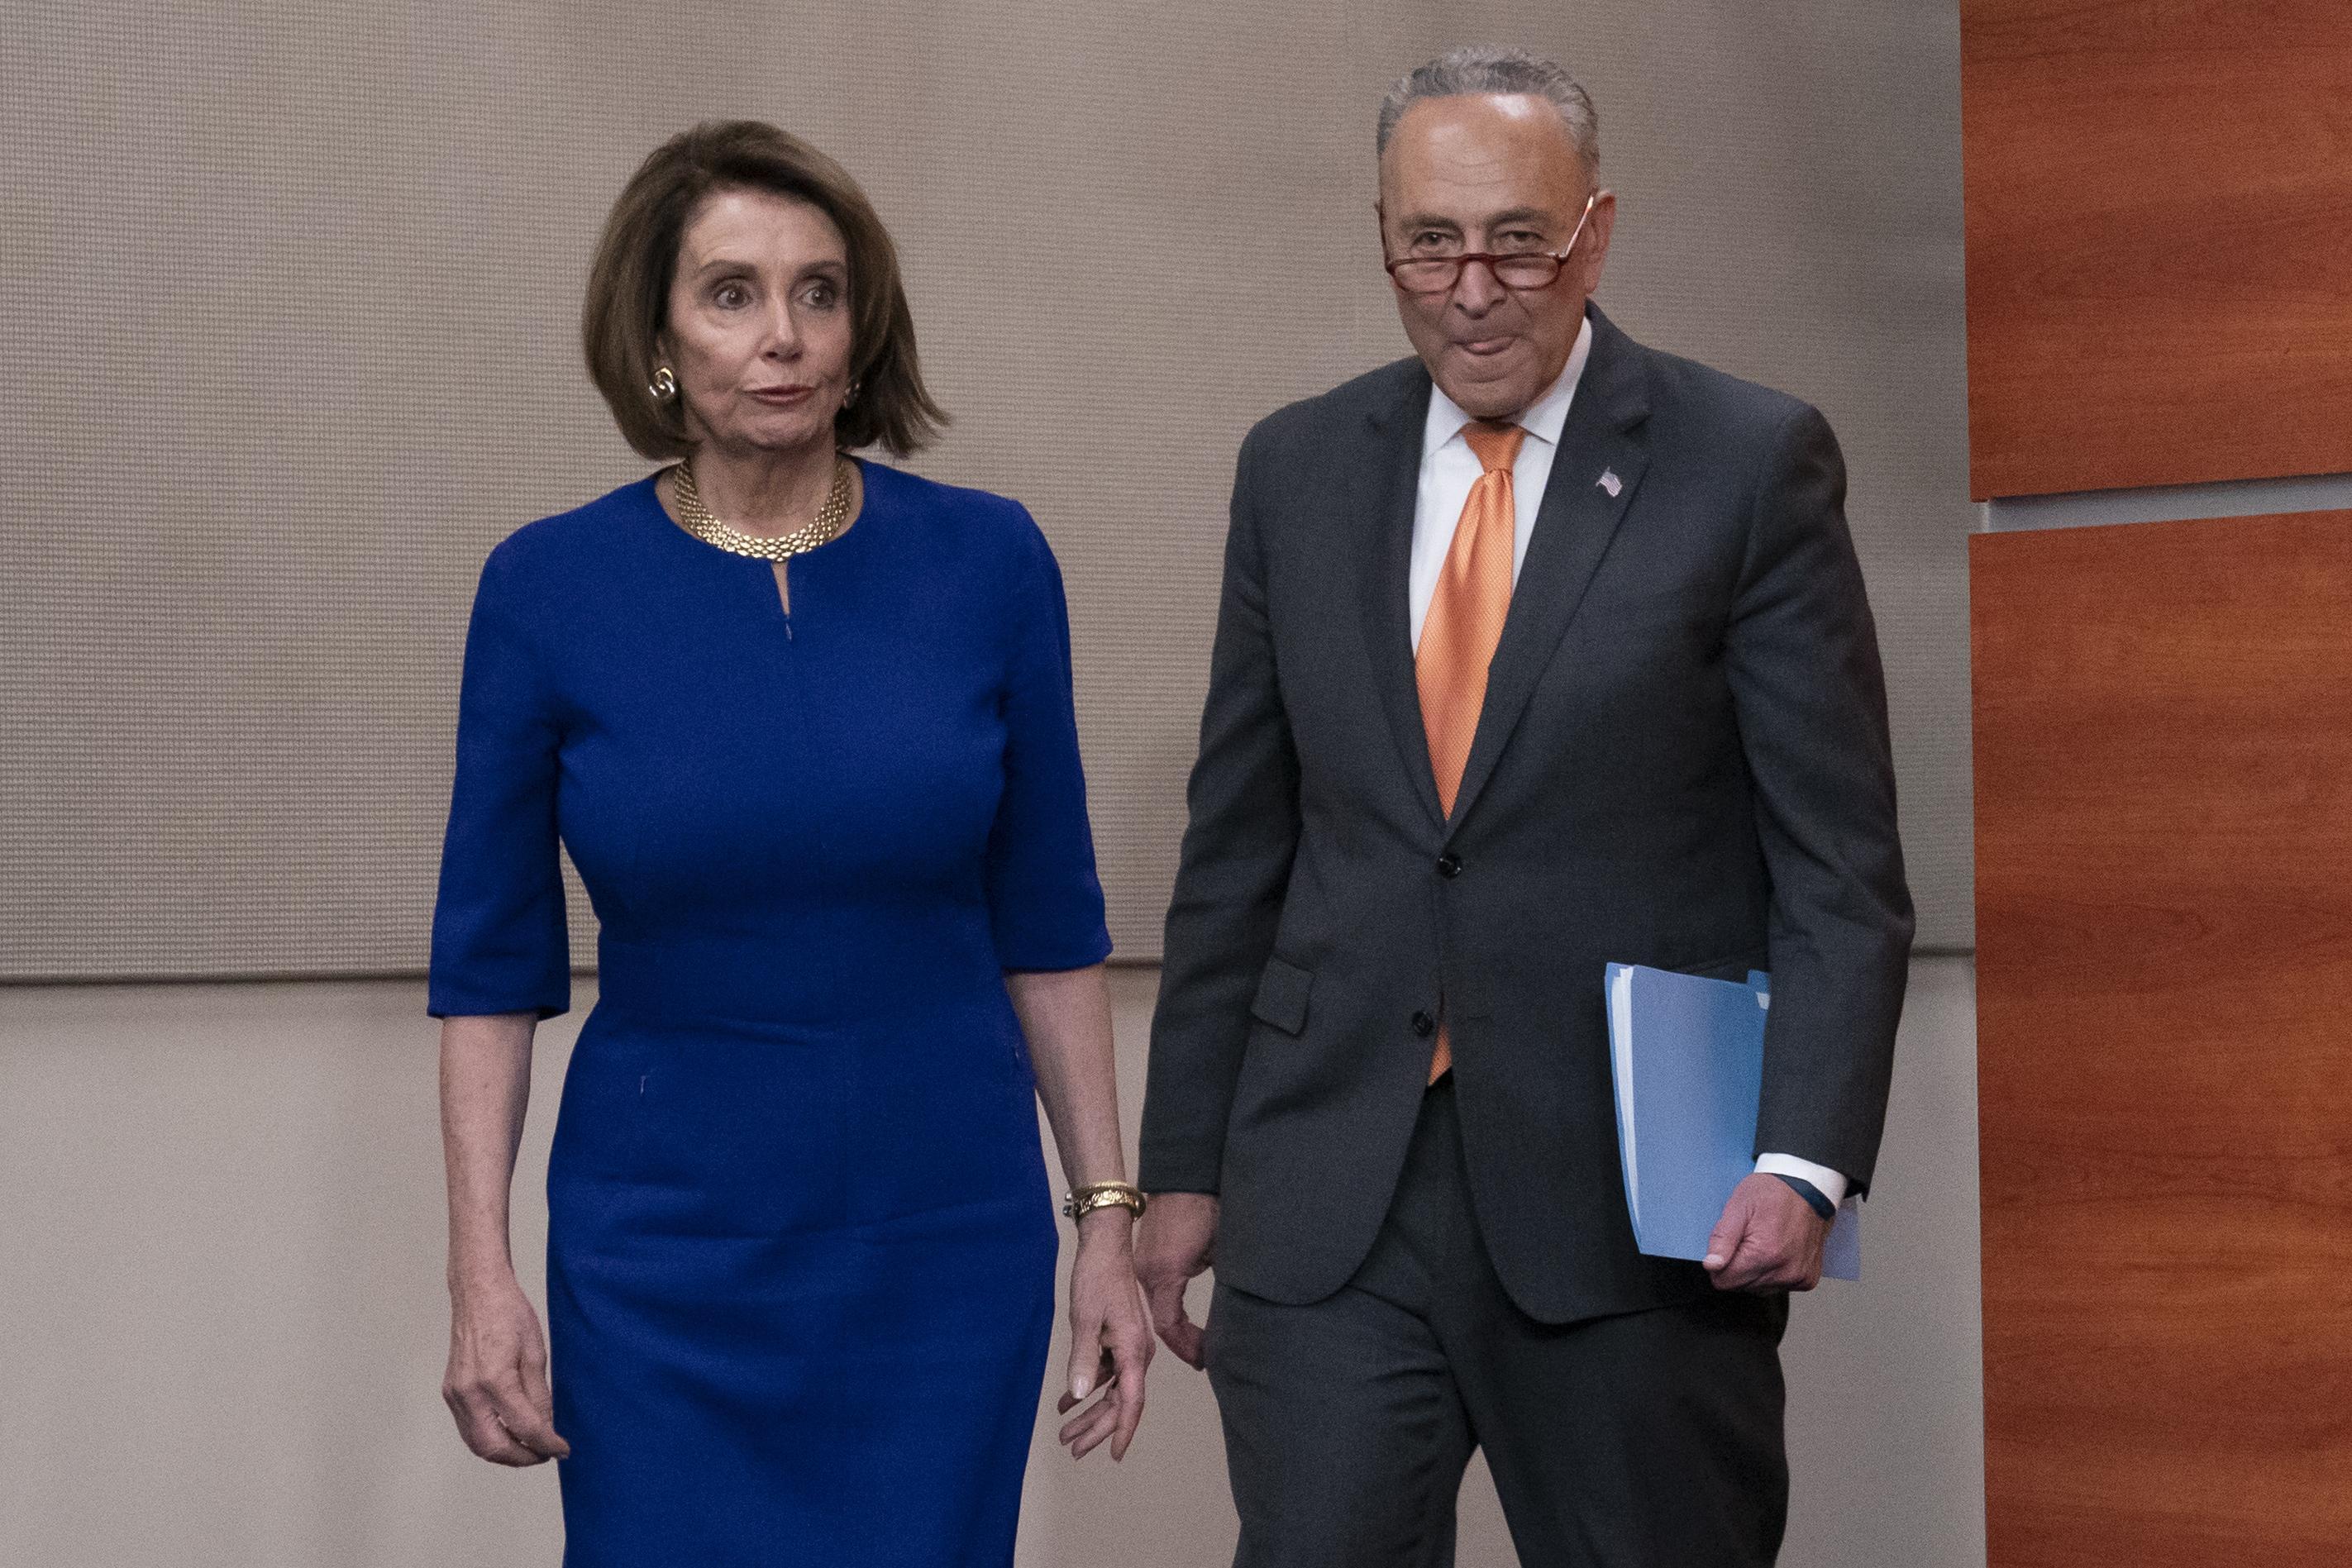 Nancy Pelosi, Chuck Schumer set vote to rebuke Trump on Syria